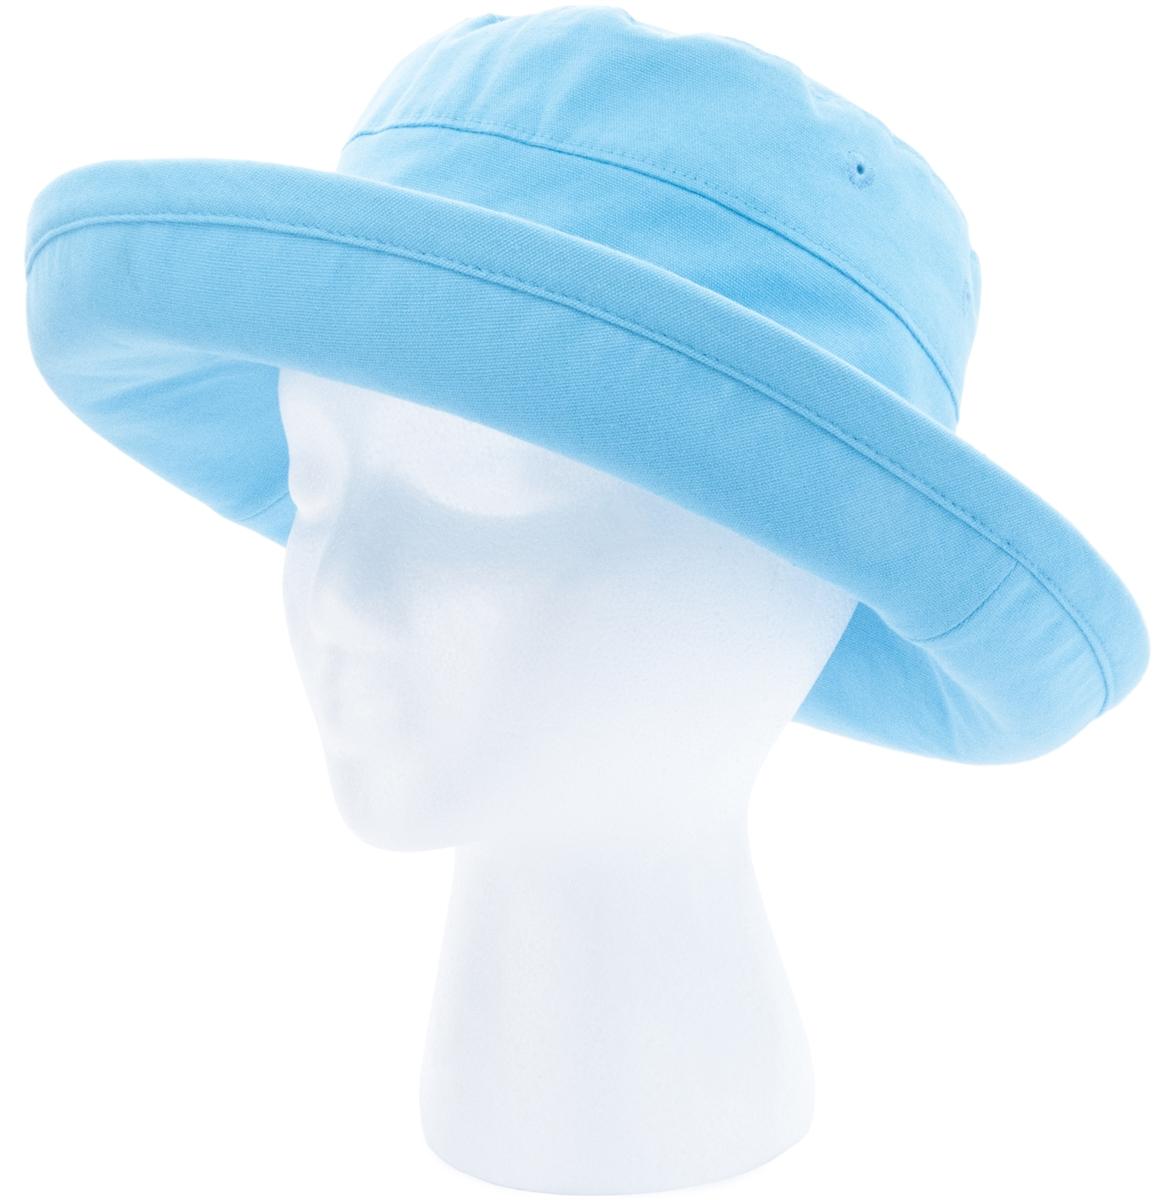 Women s Classic Bucket Hat - Teal Blue UPF 50+ 50ed763a227